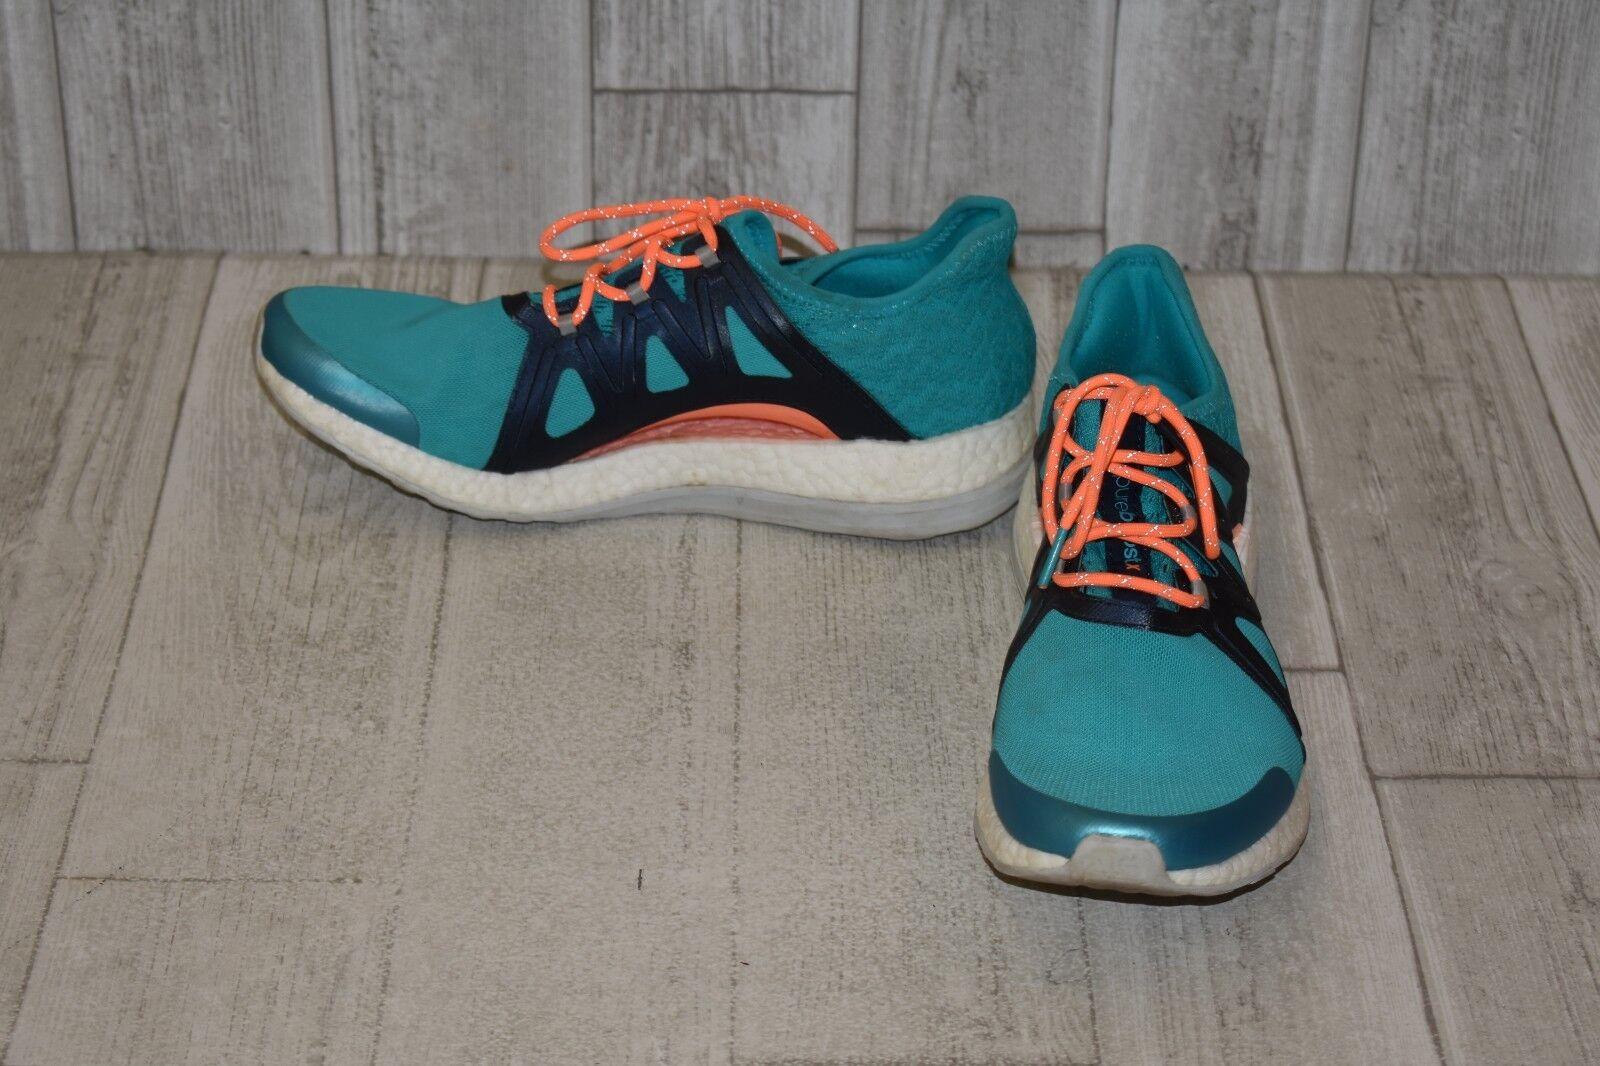 Adidas PureBoost Xpose Clima Sneaker - Women's Size 10 bluee